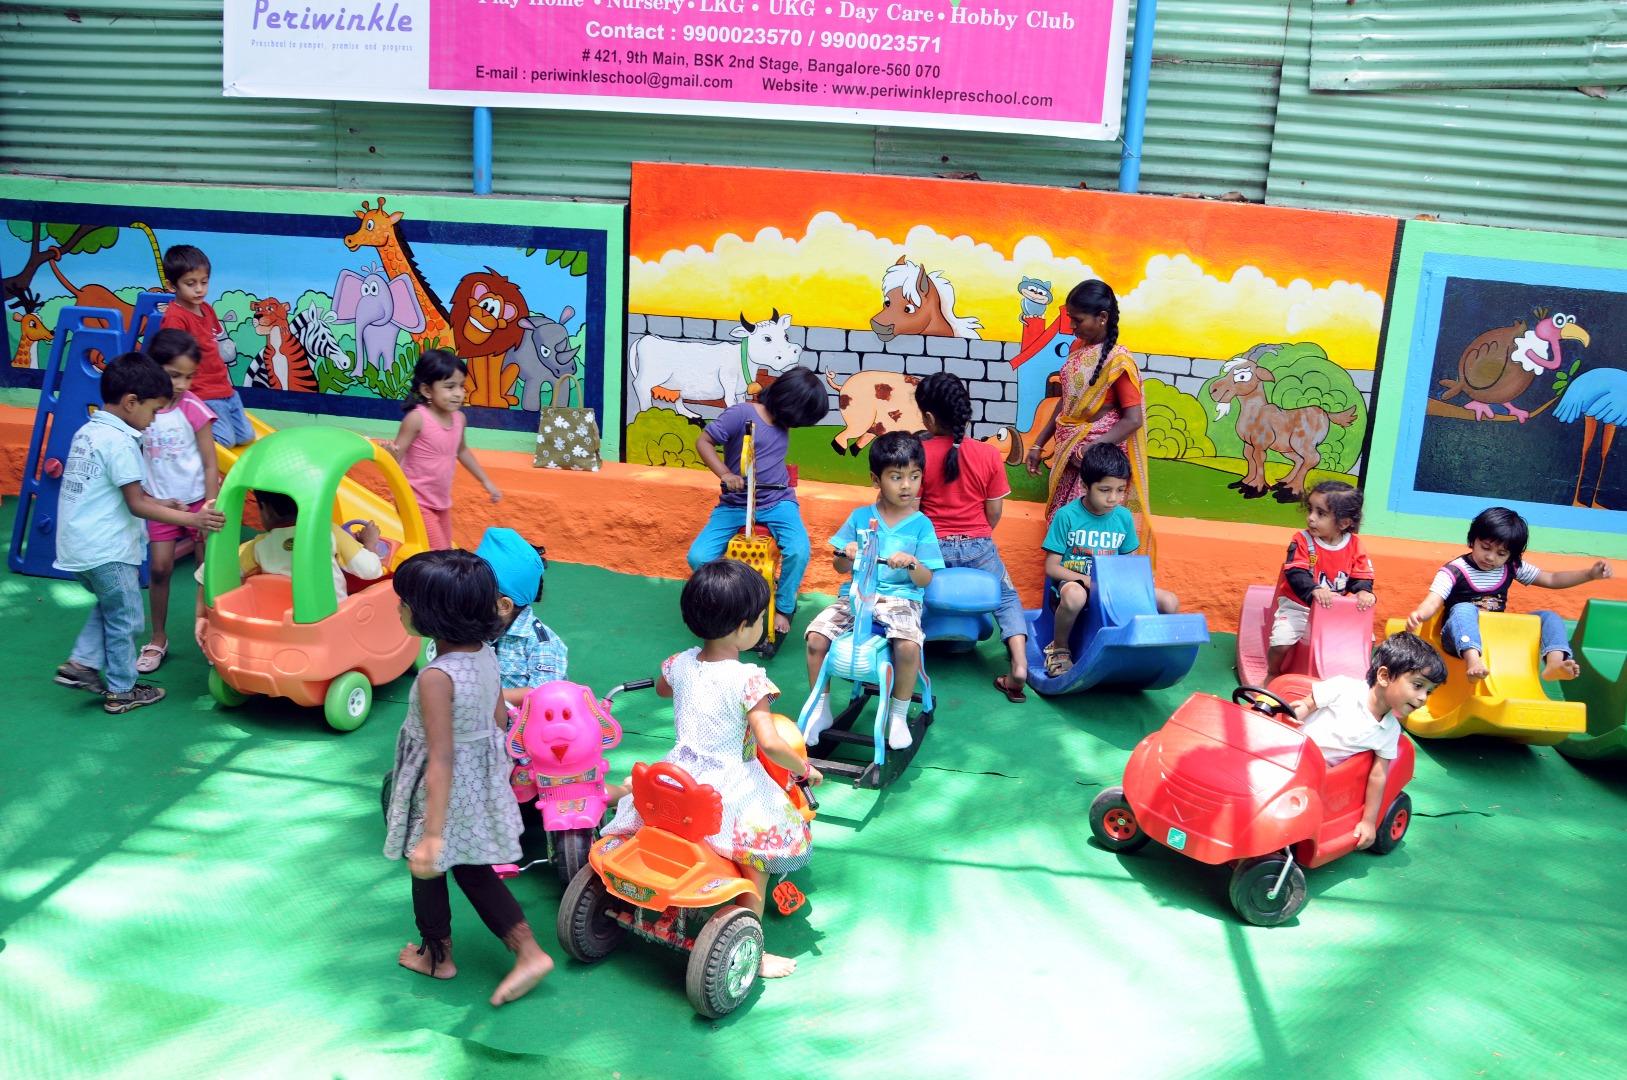 Periwinkle Preschool